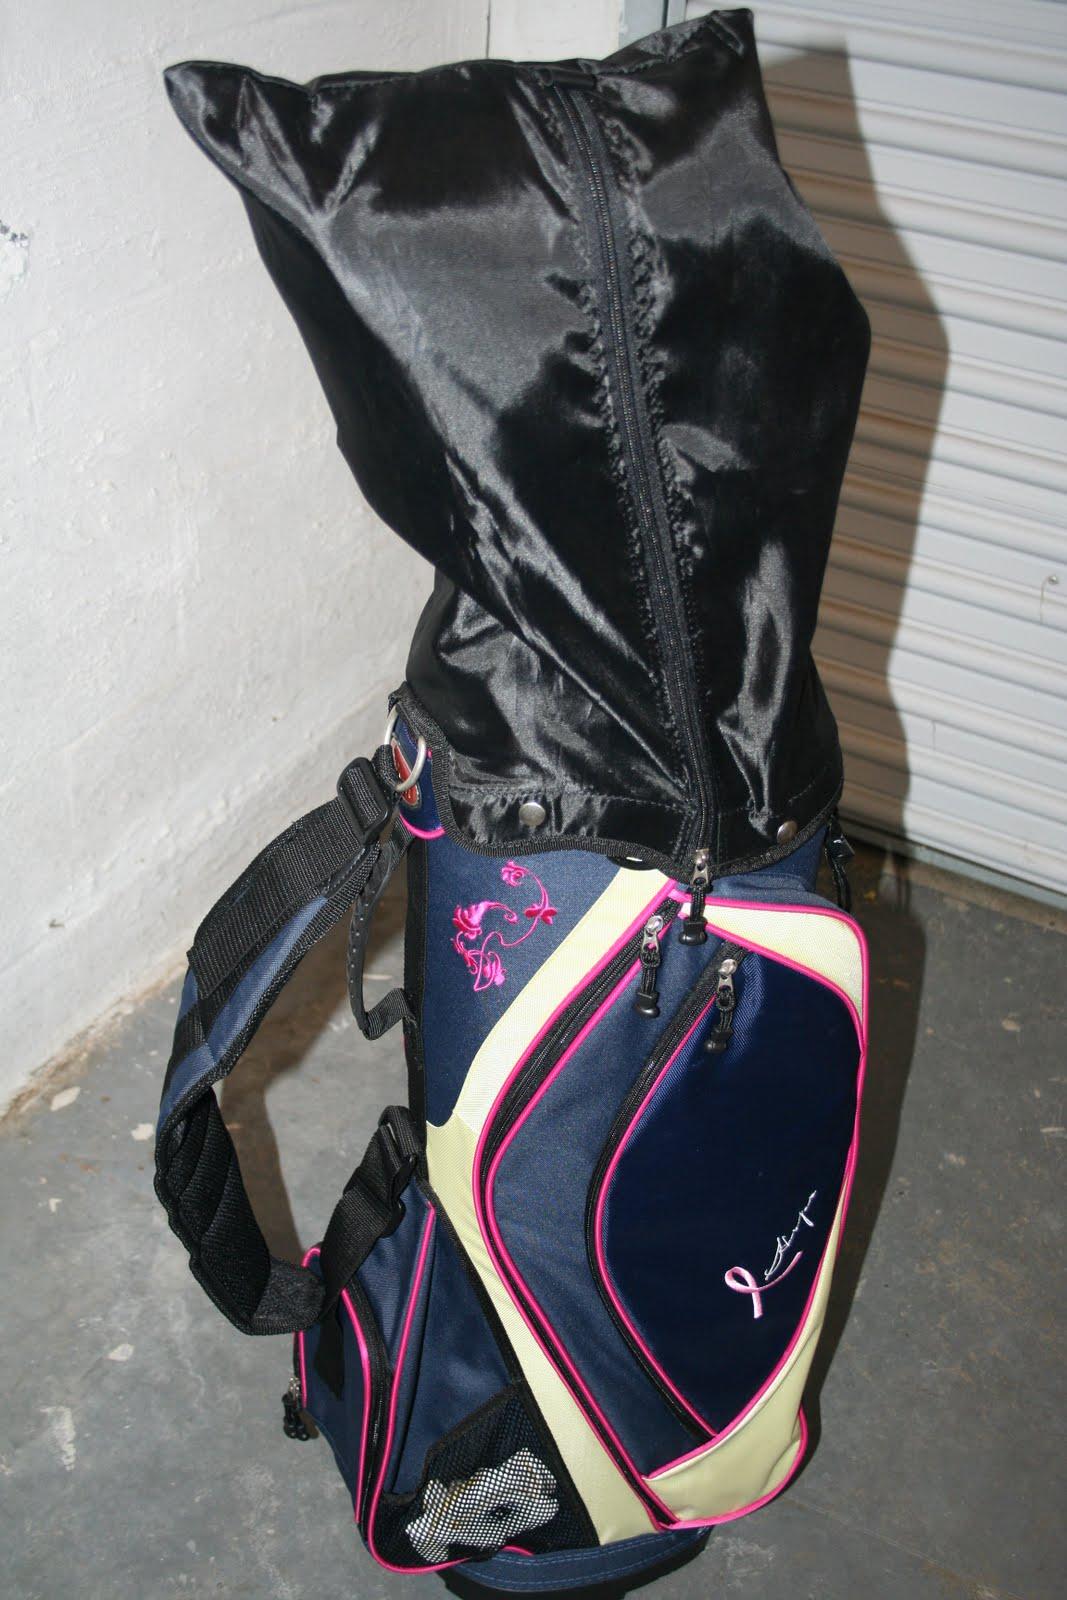 Wilson breast cancer golf